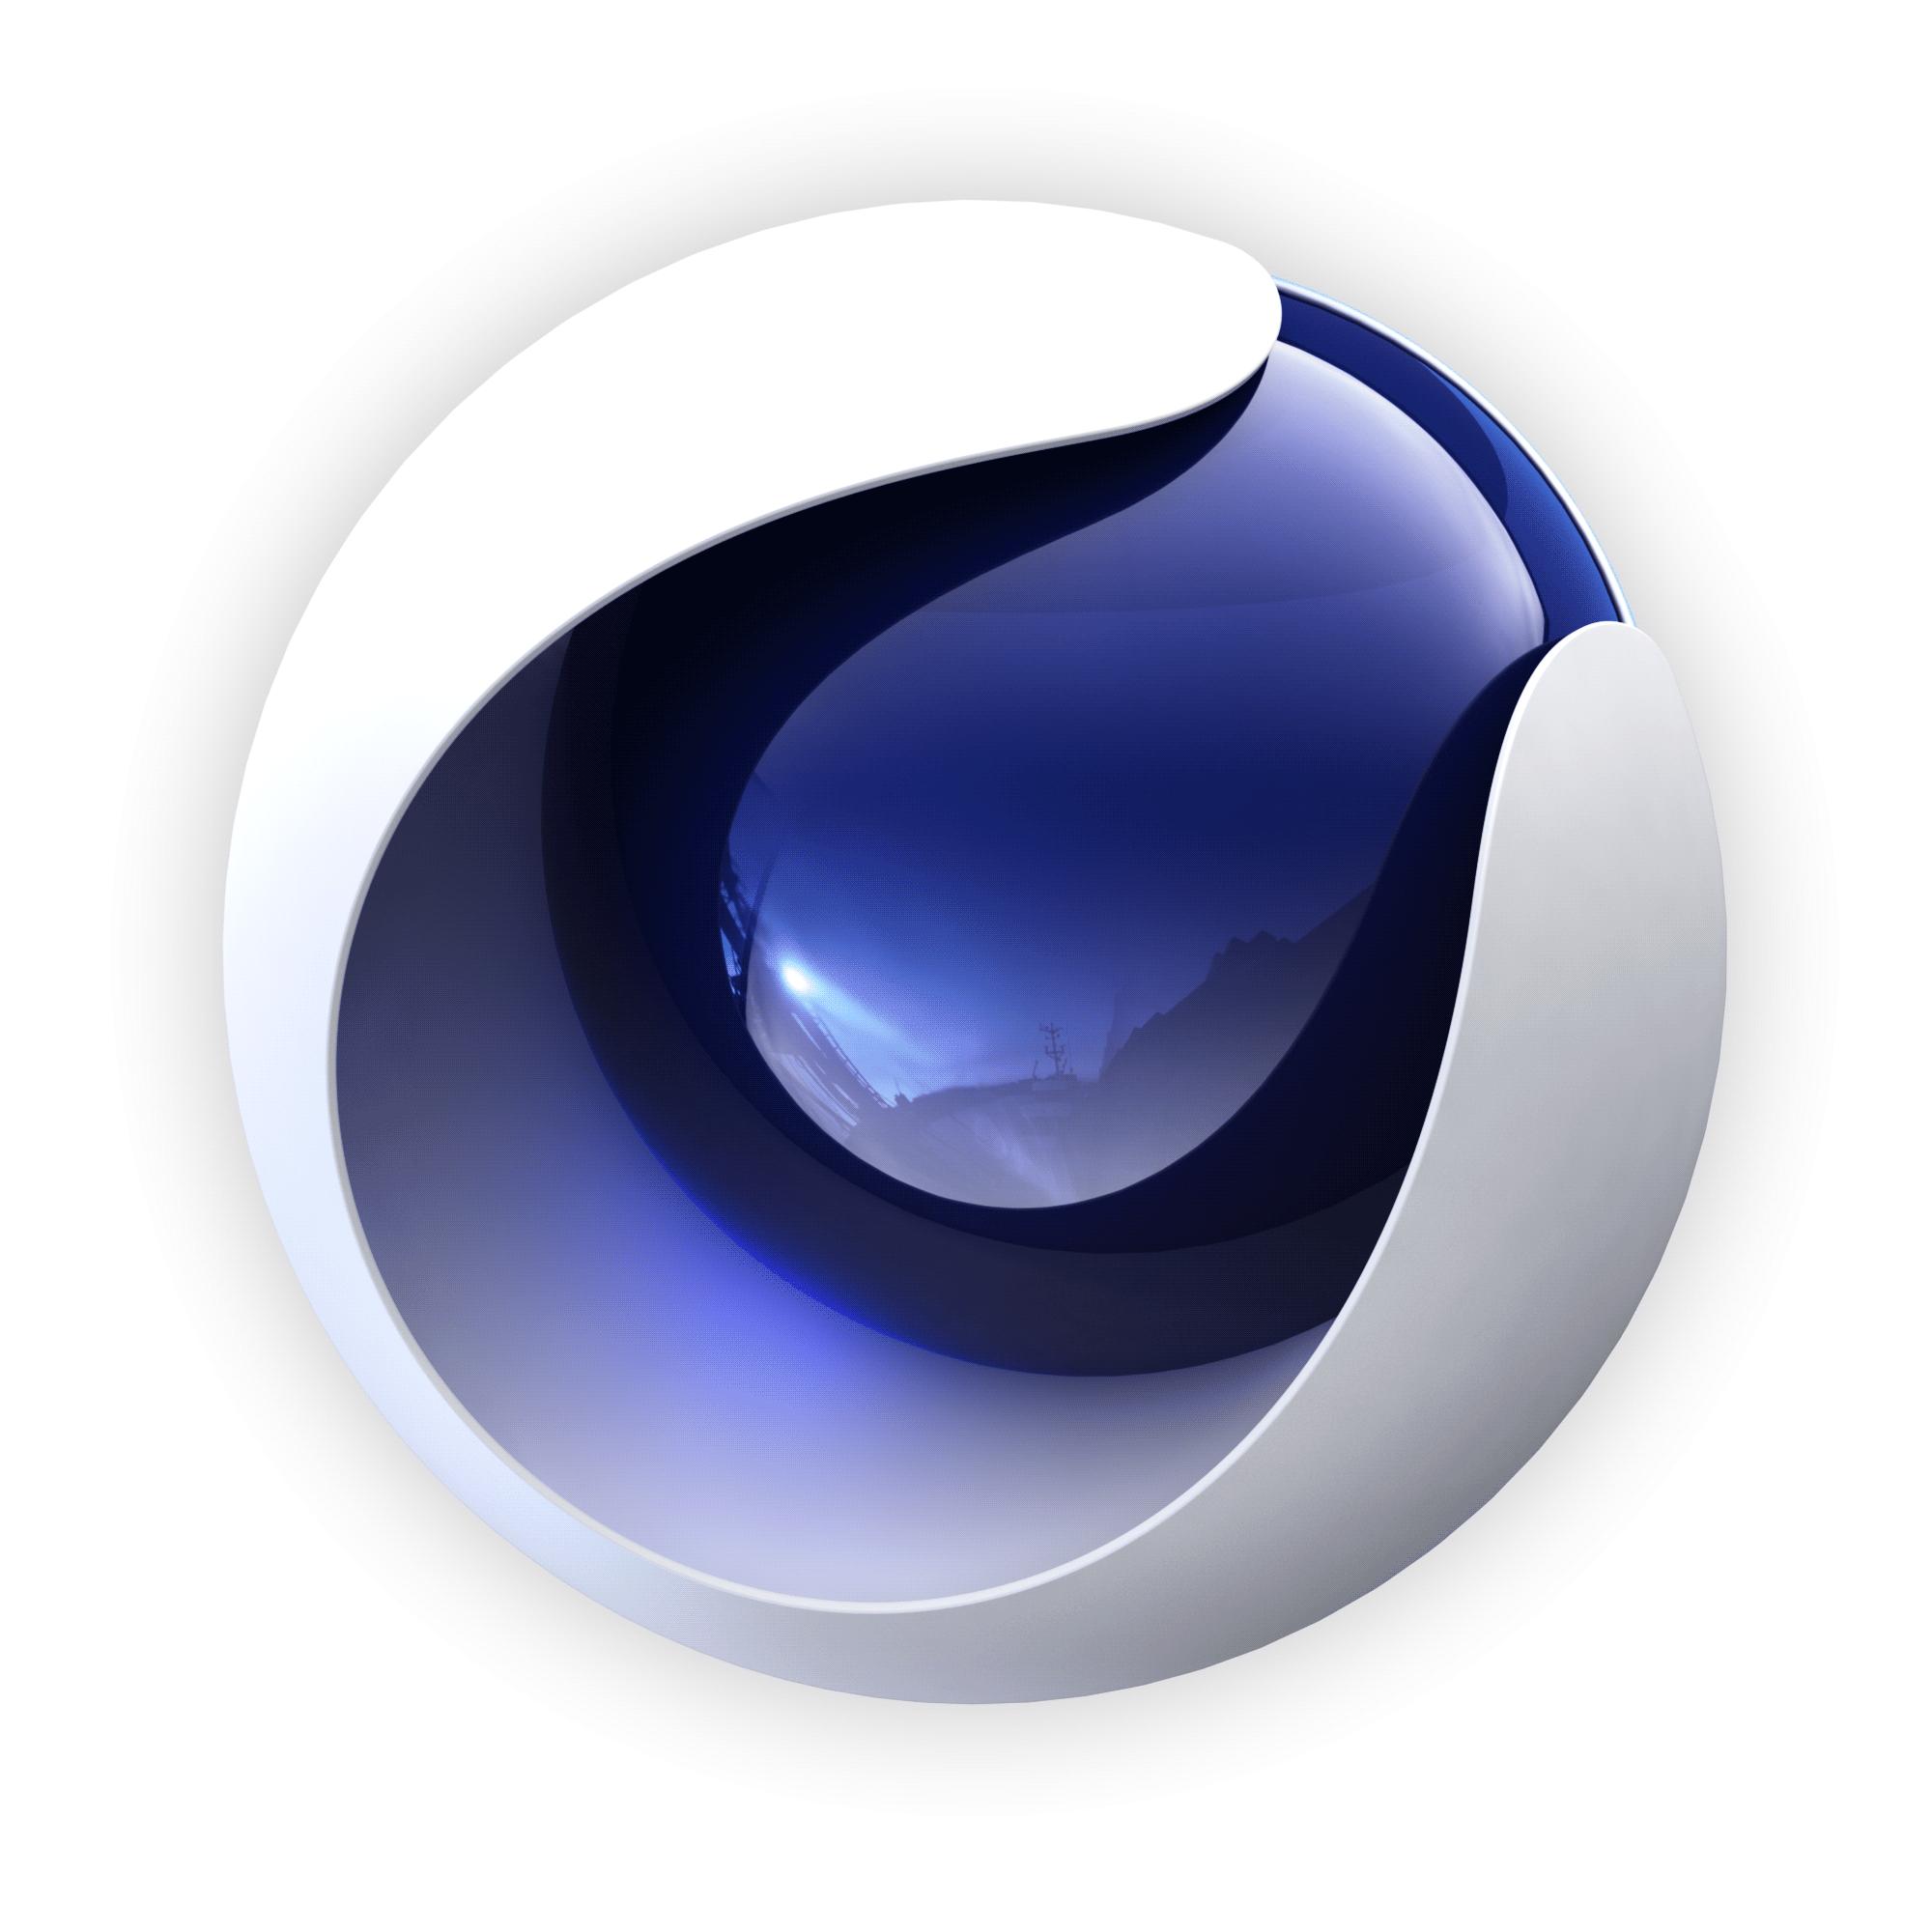 c4d icon Google Search Cinema 4d, Maxon cinema 4d